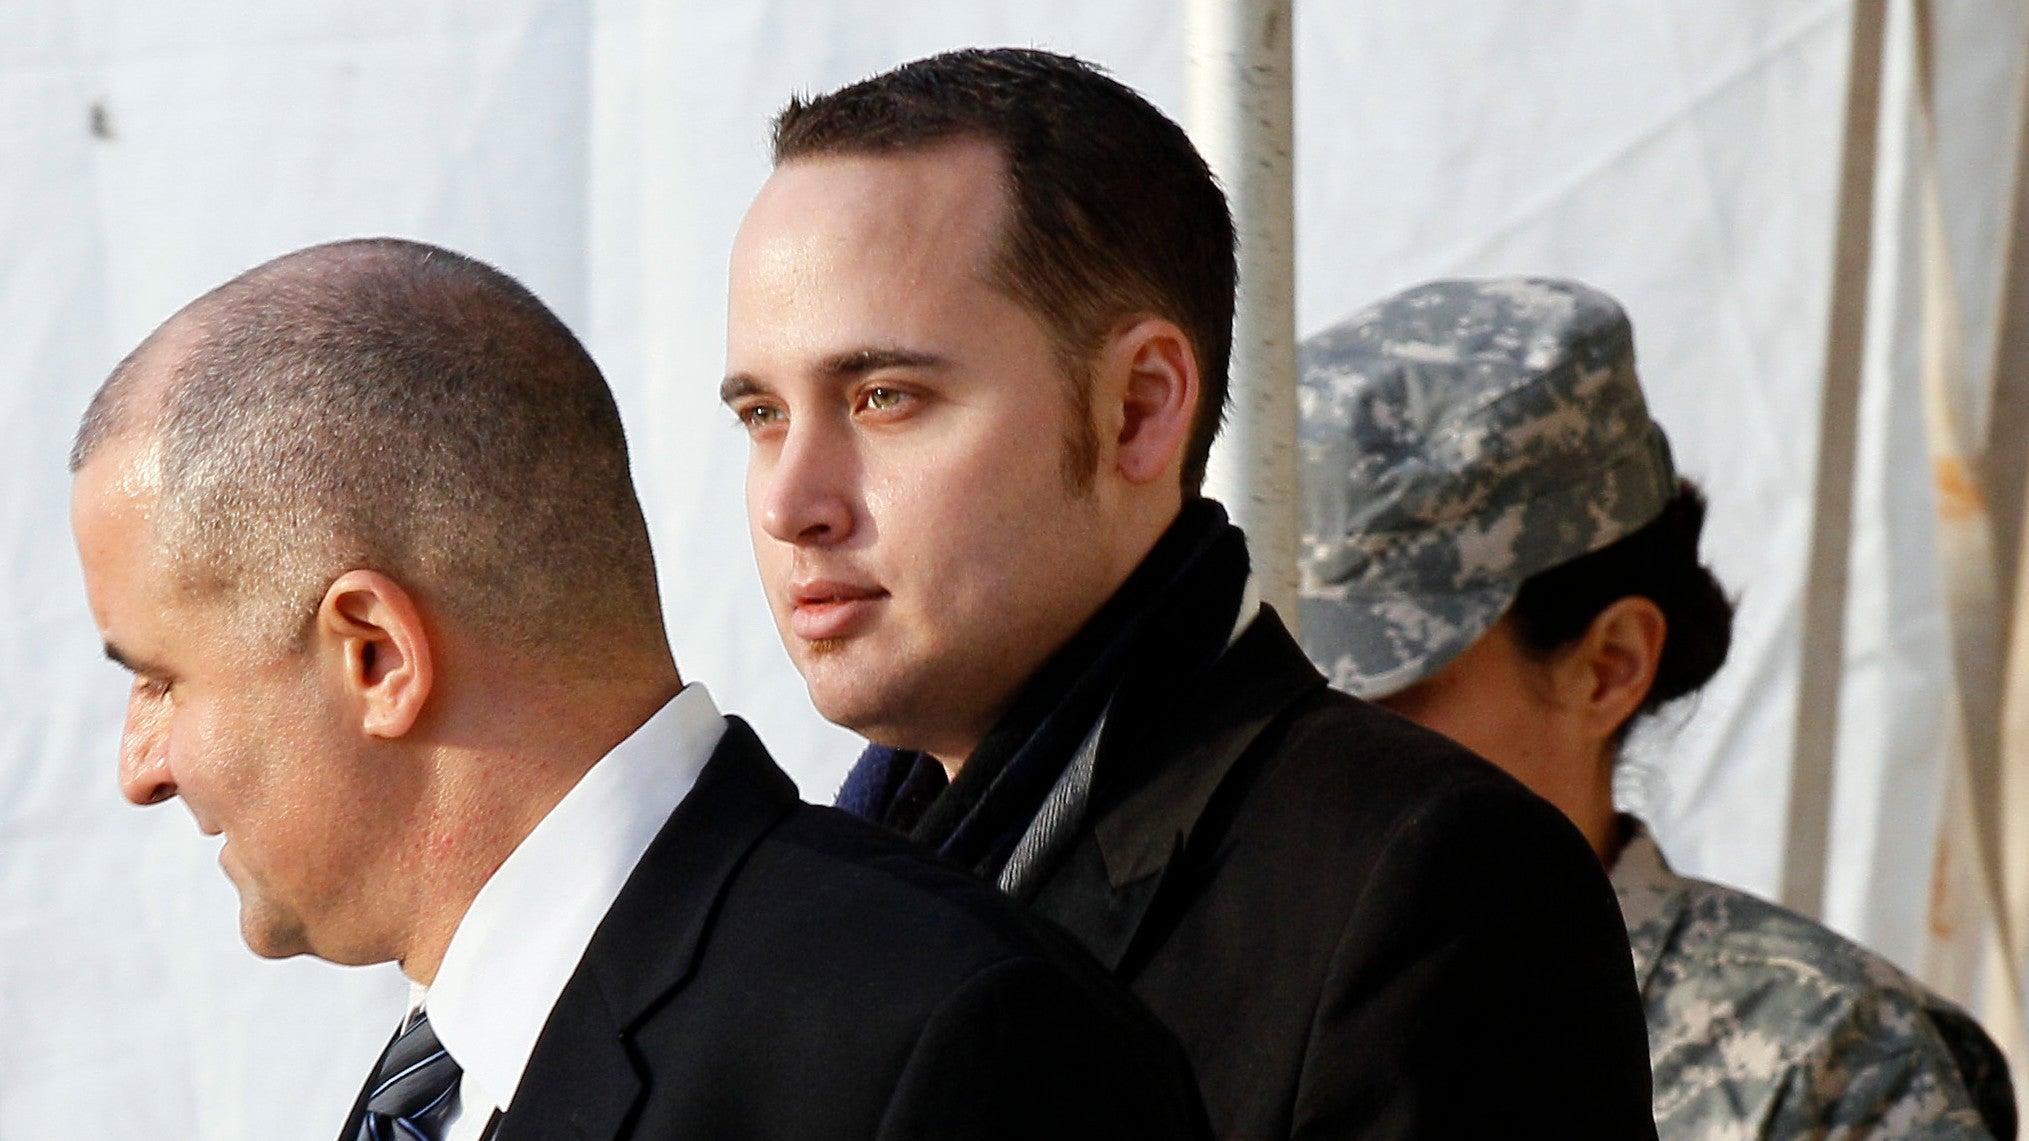 adrian-lamo chelsea-manning federal-bureau-of-investigation julian-assange wikileaks